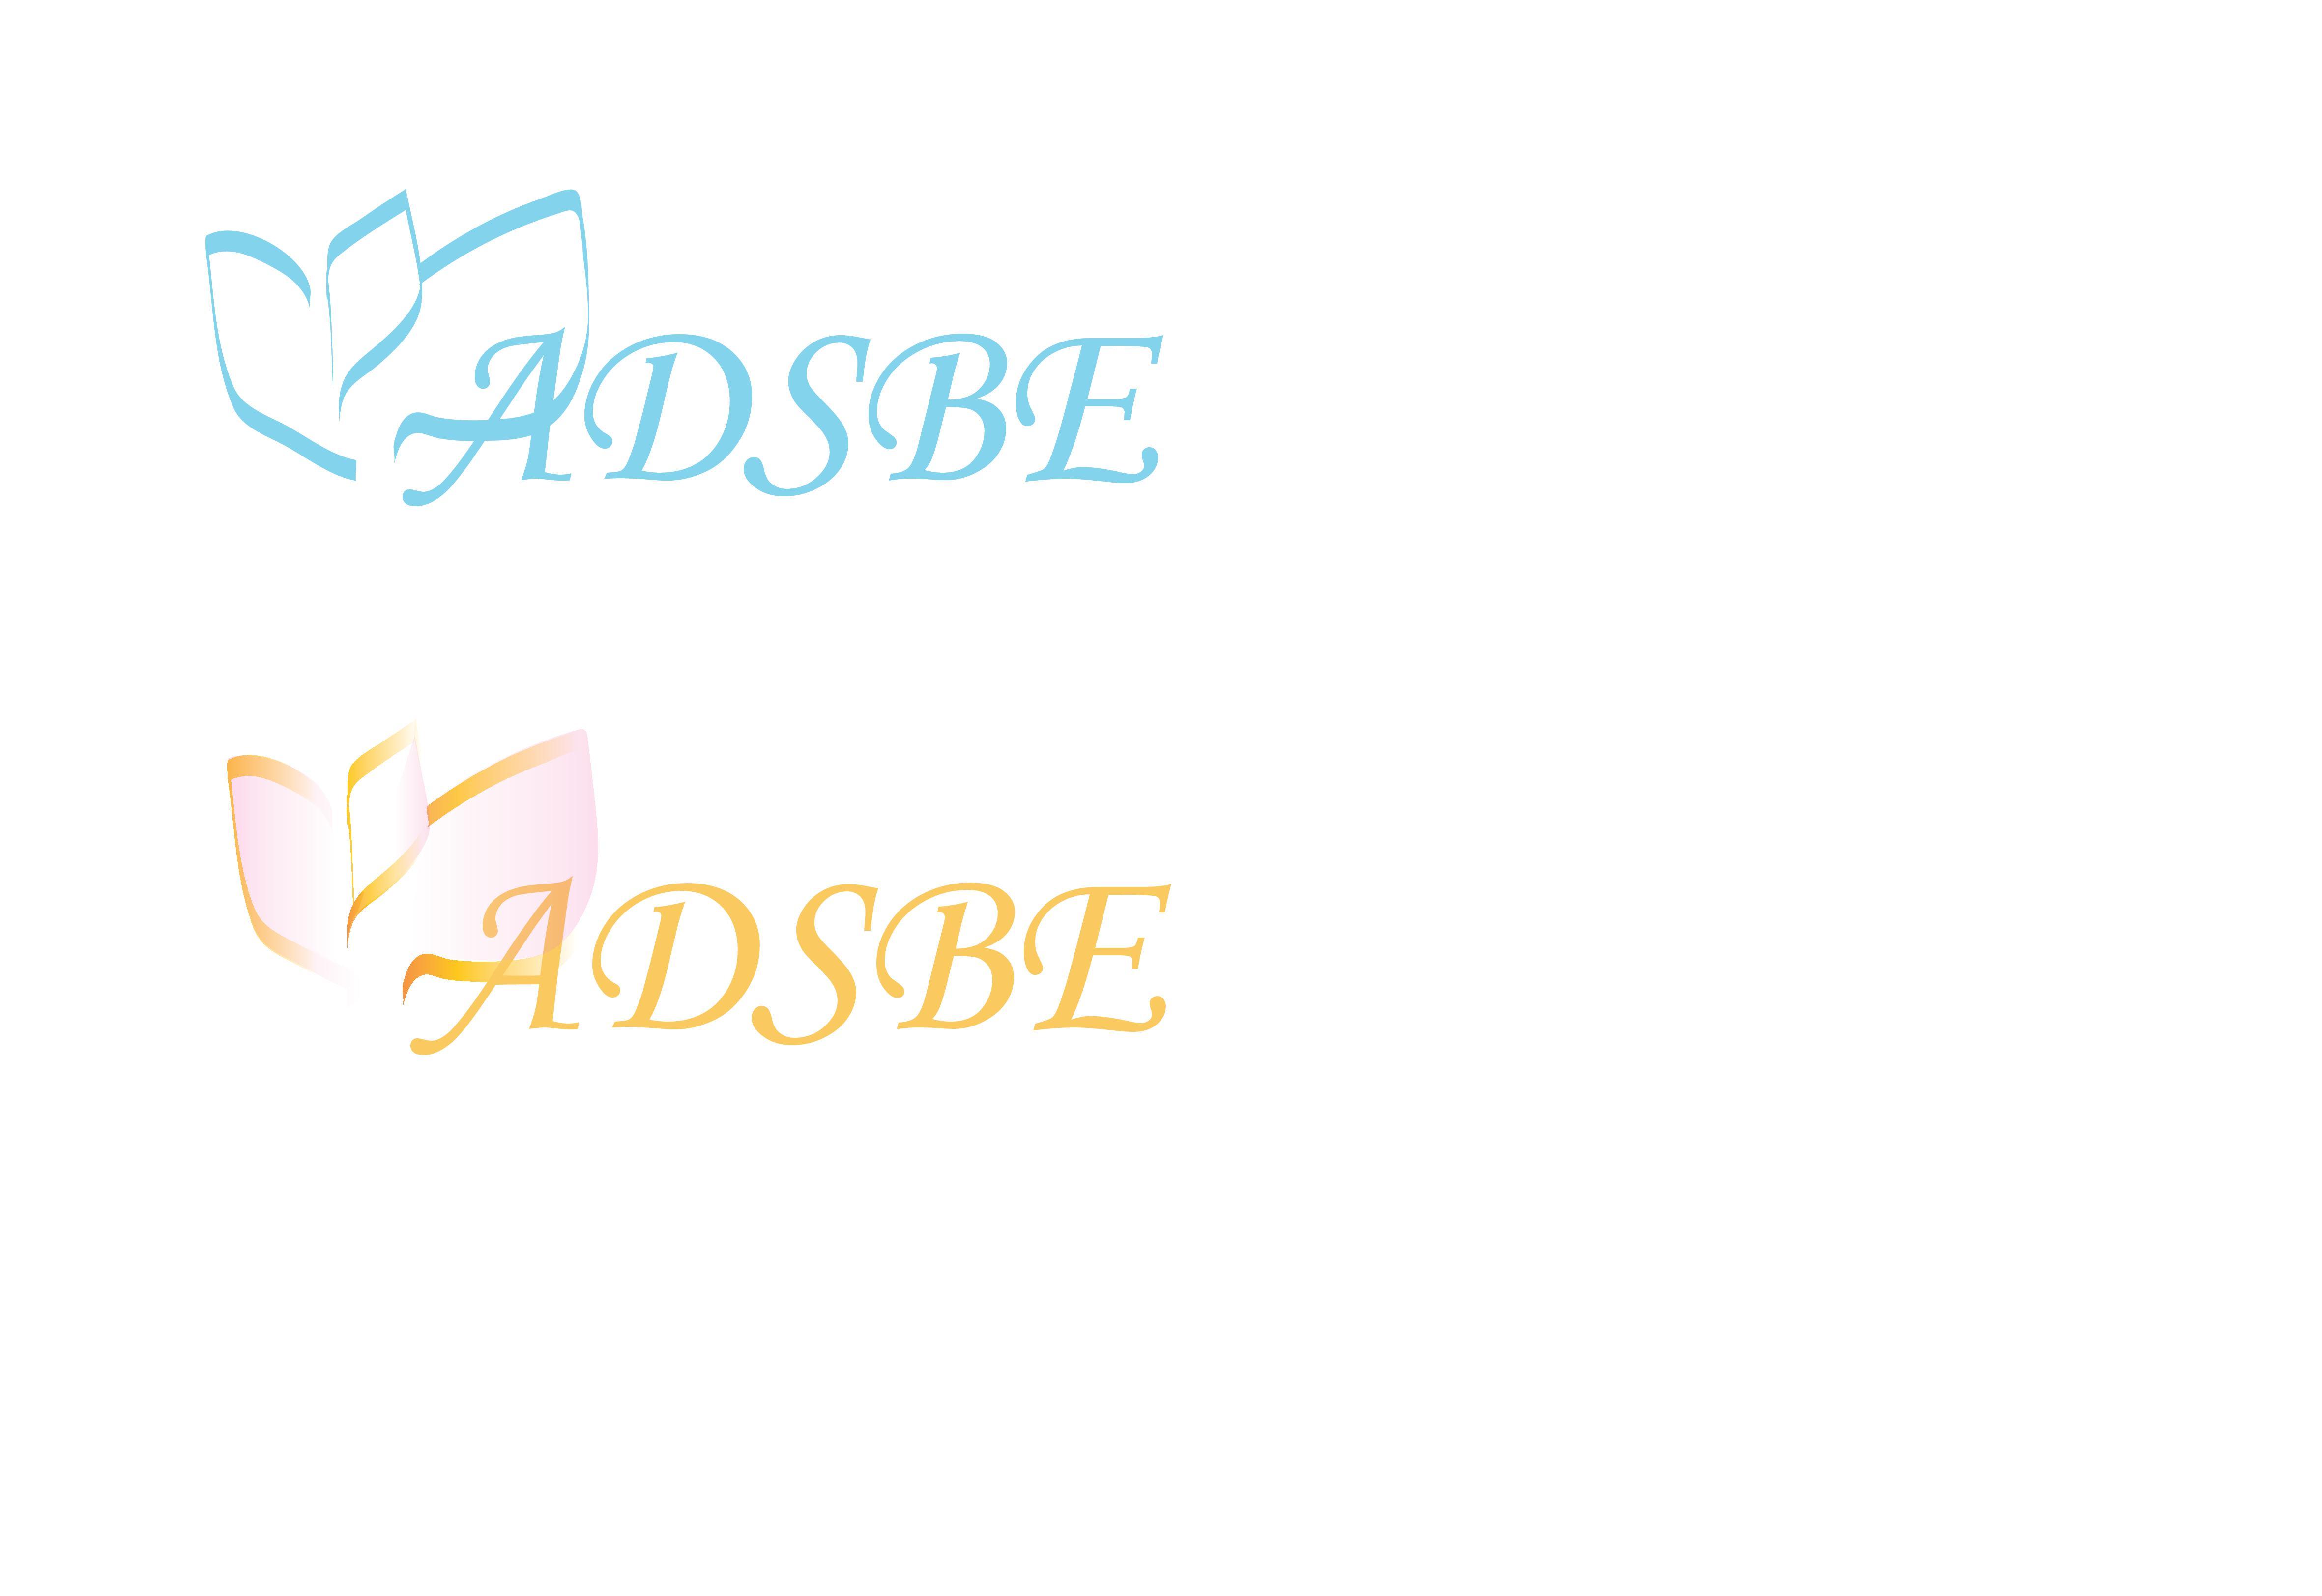 Разработка логотипа для CPA-сети фото f_058587605023ed82.jpg